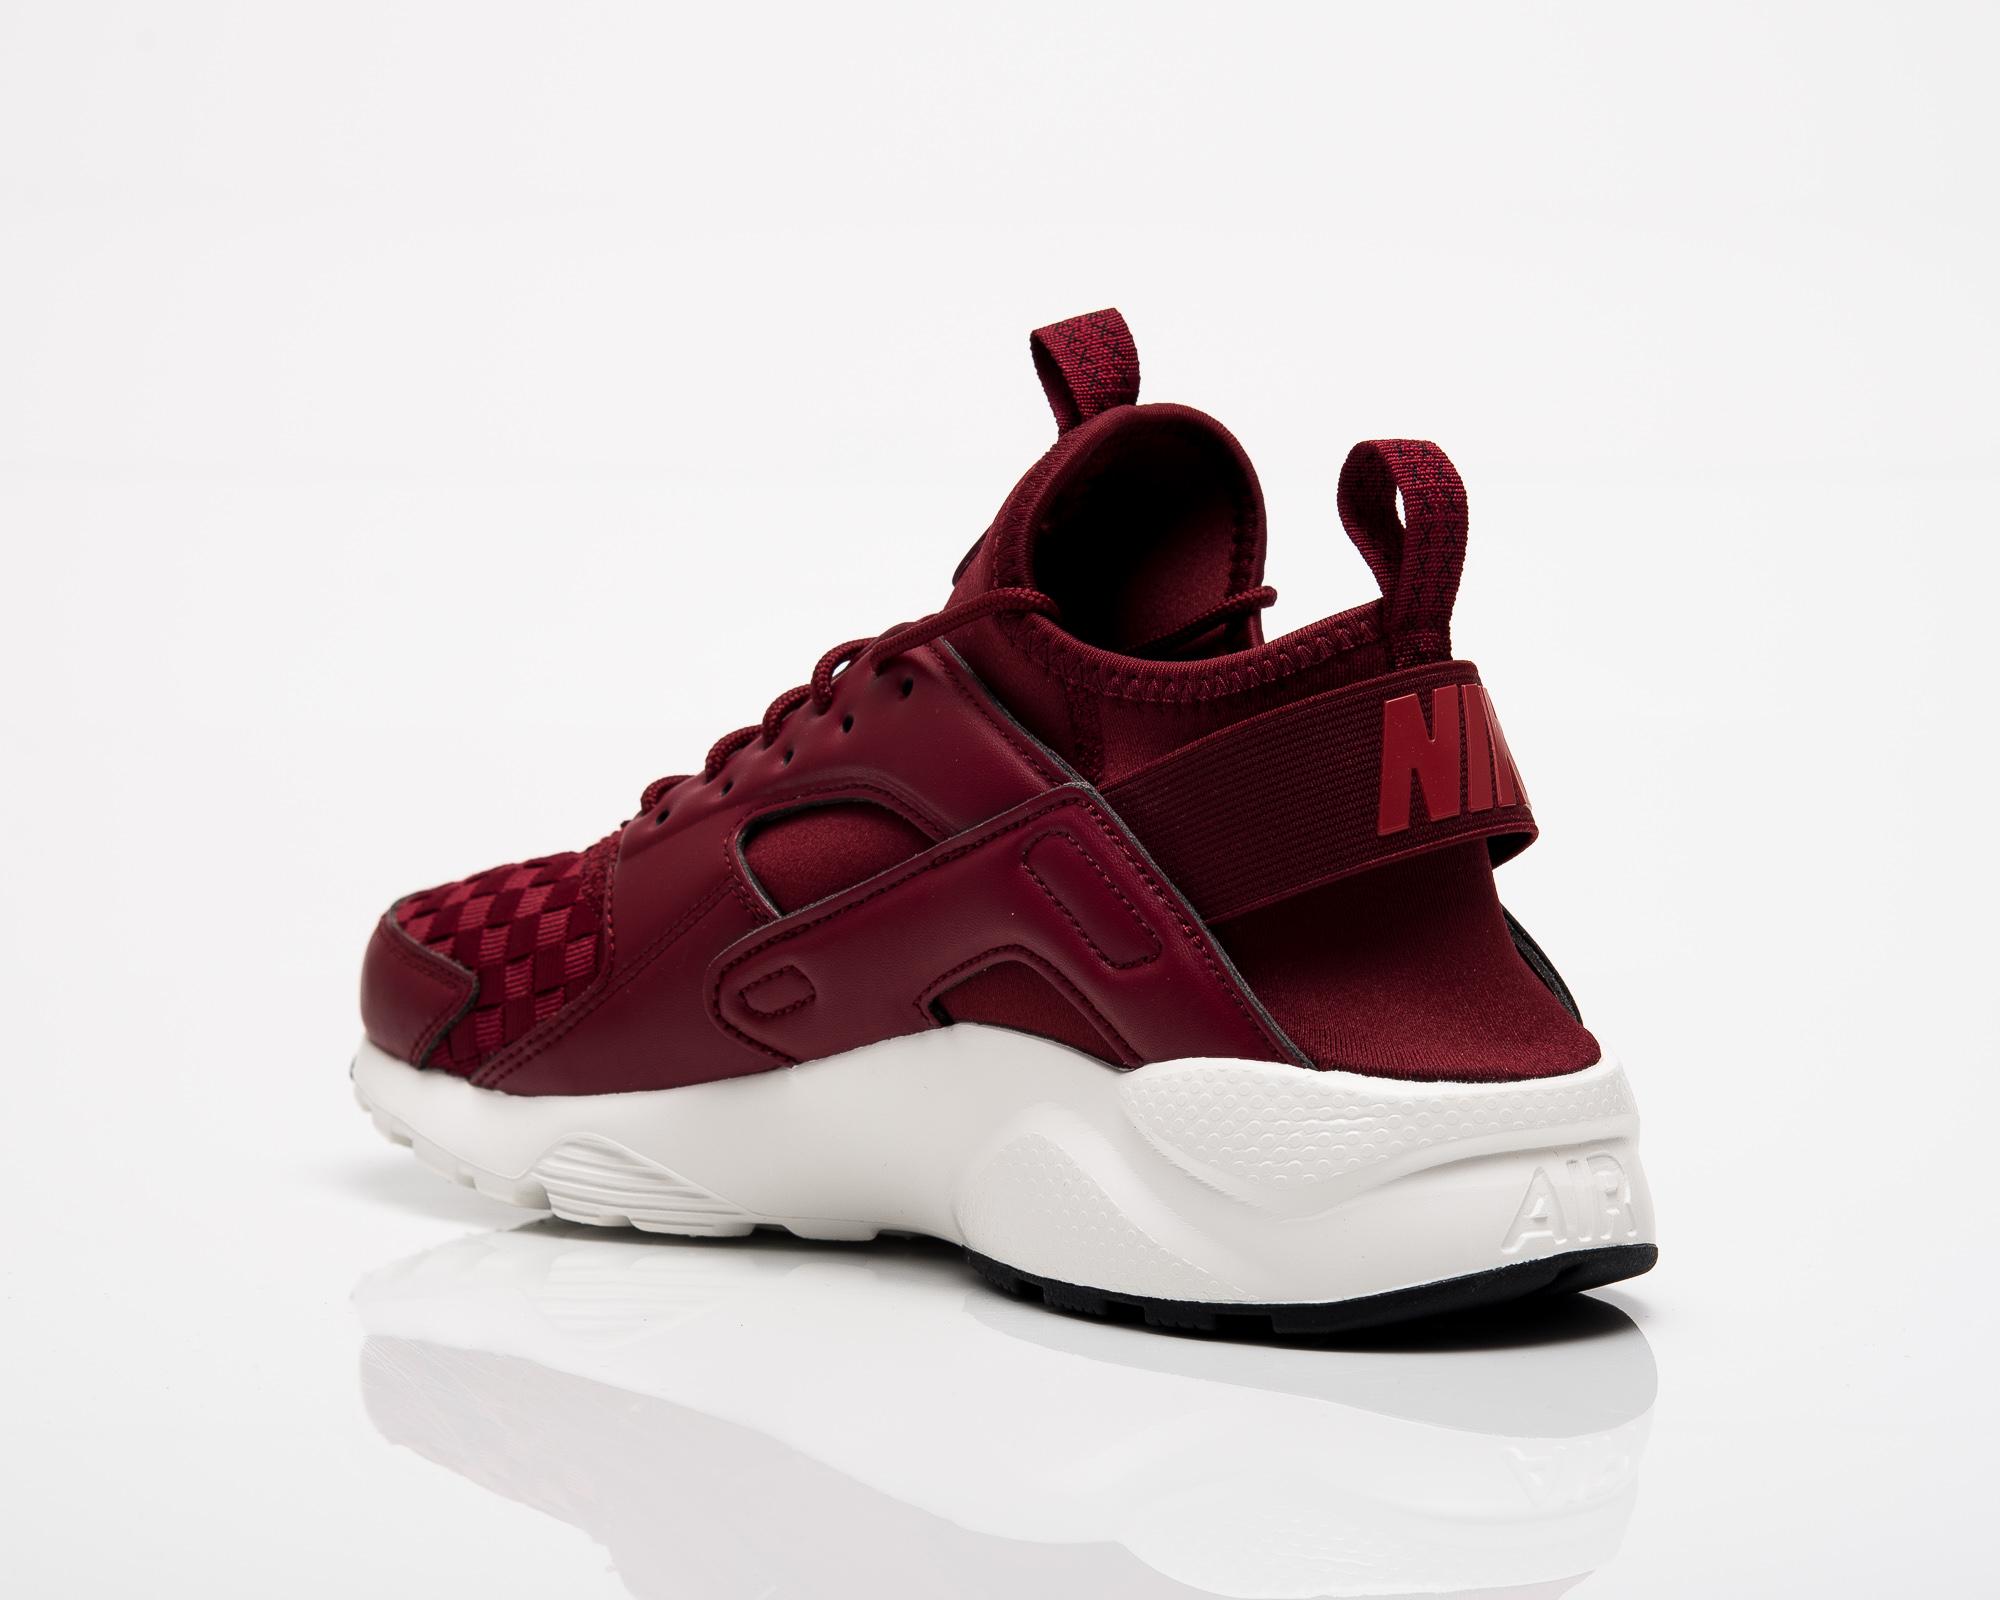 7ef9aa90b8a68 Nike Air Huarache Run Ultra SE - Shoes Casual - Sporting goods